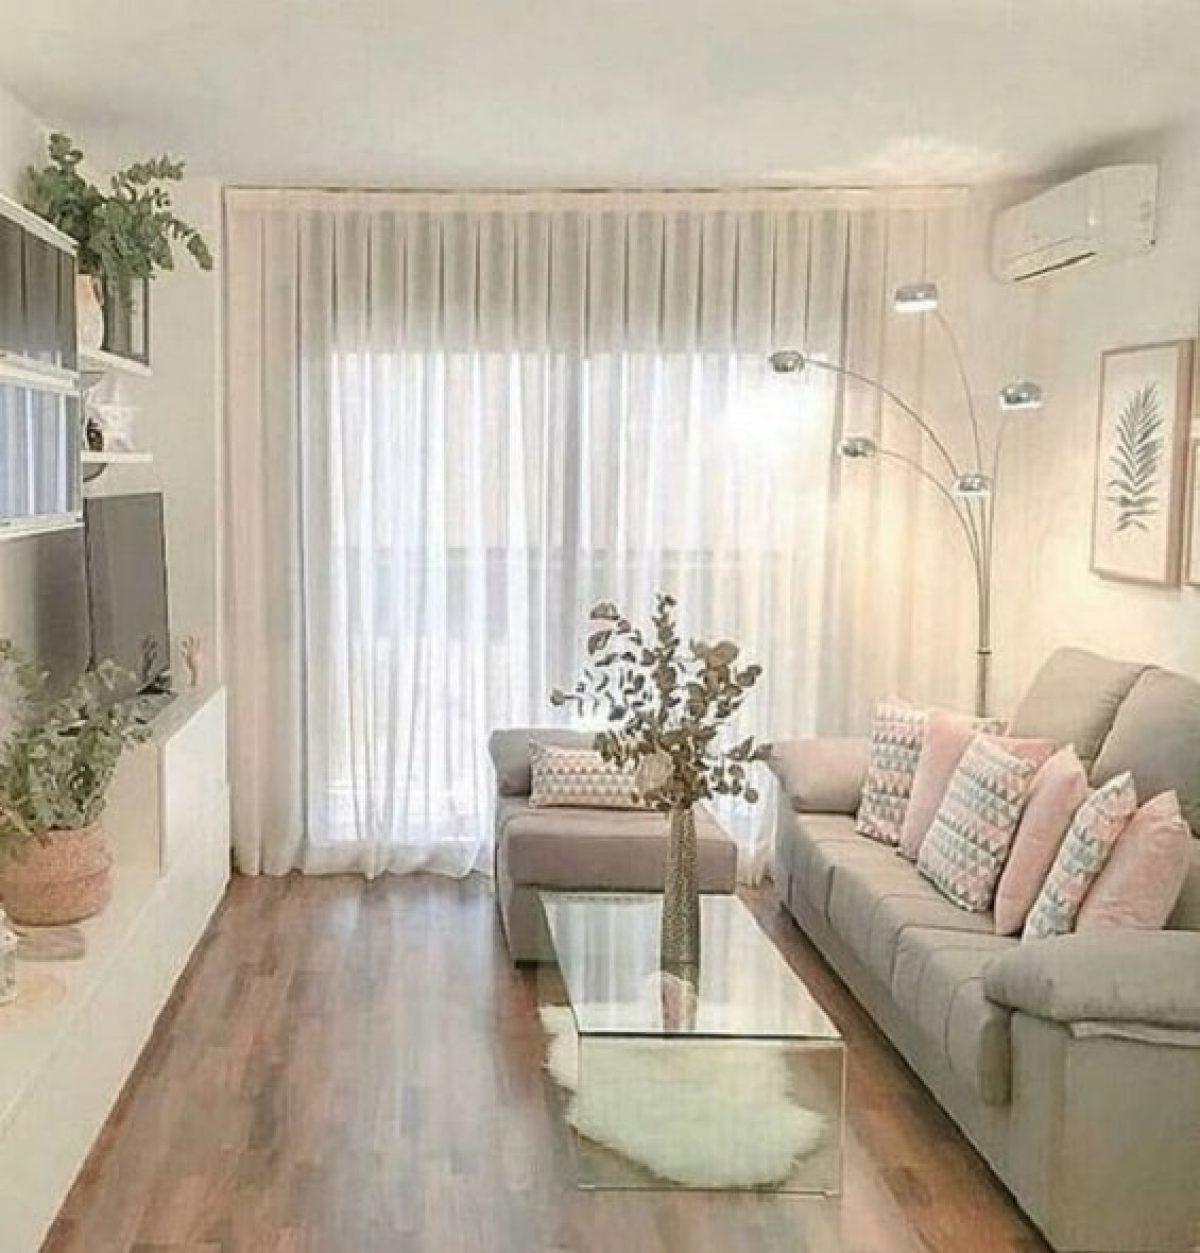 Desain Ruang Tamu Sederhana Minimalis Untuk Hunian Idaman